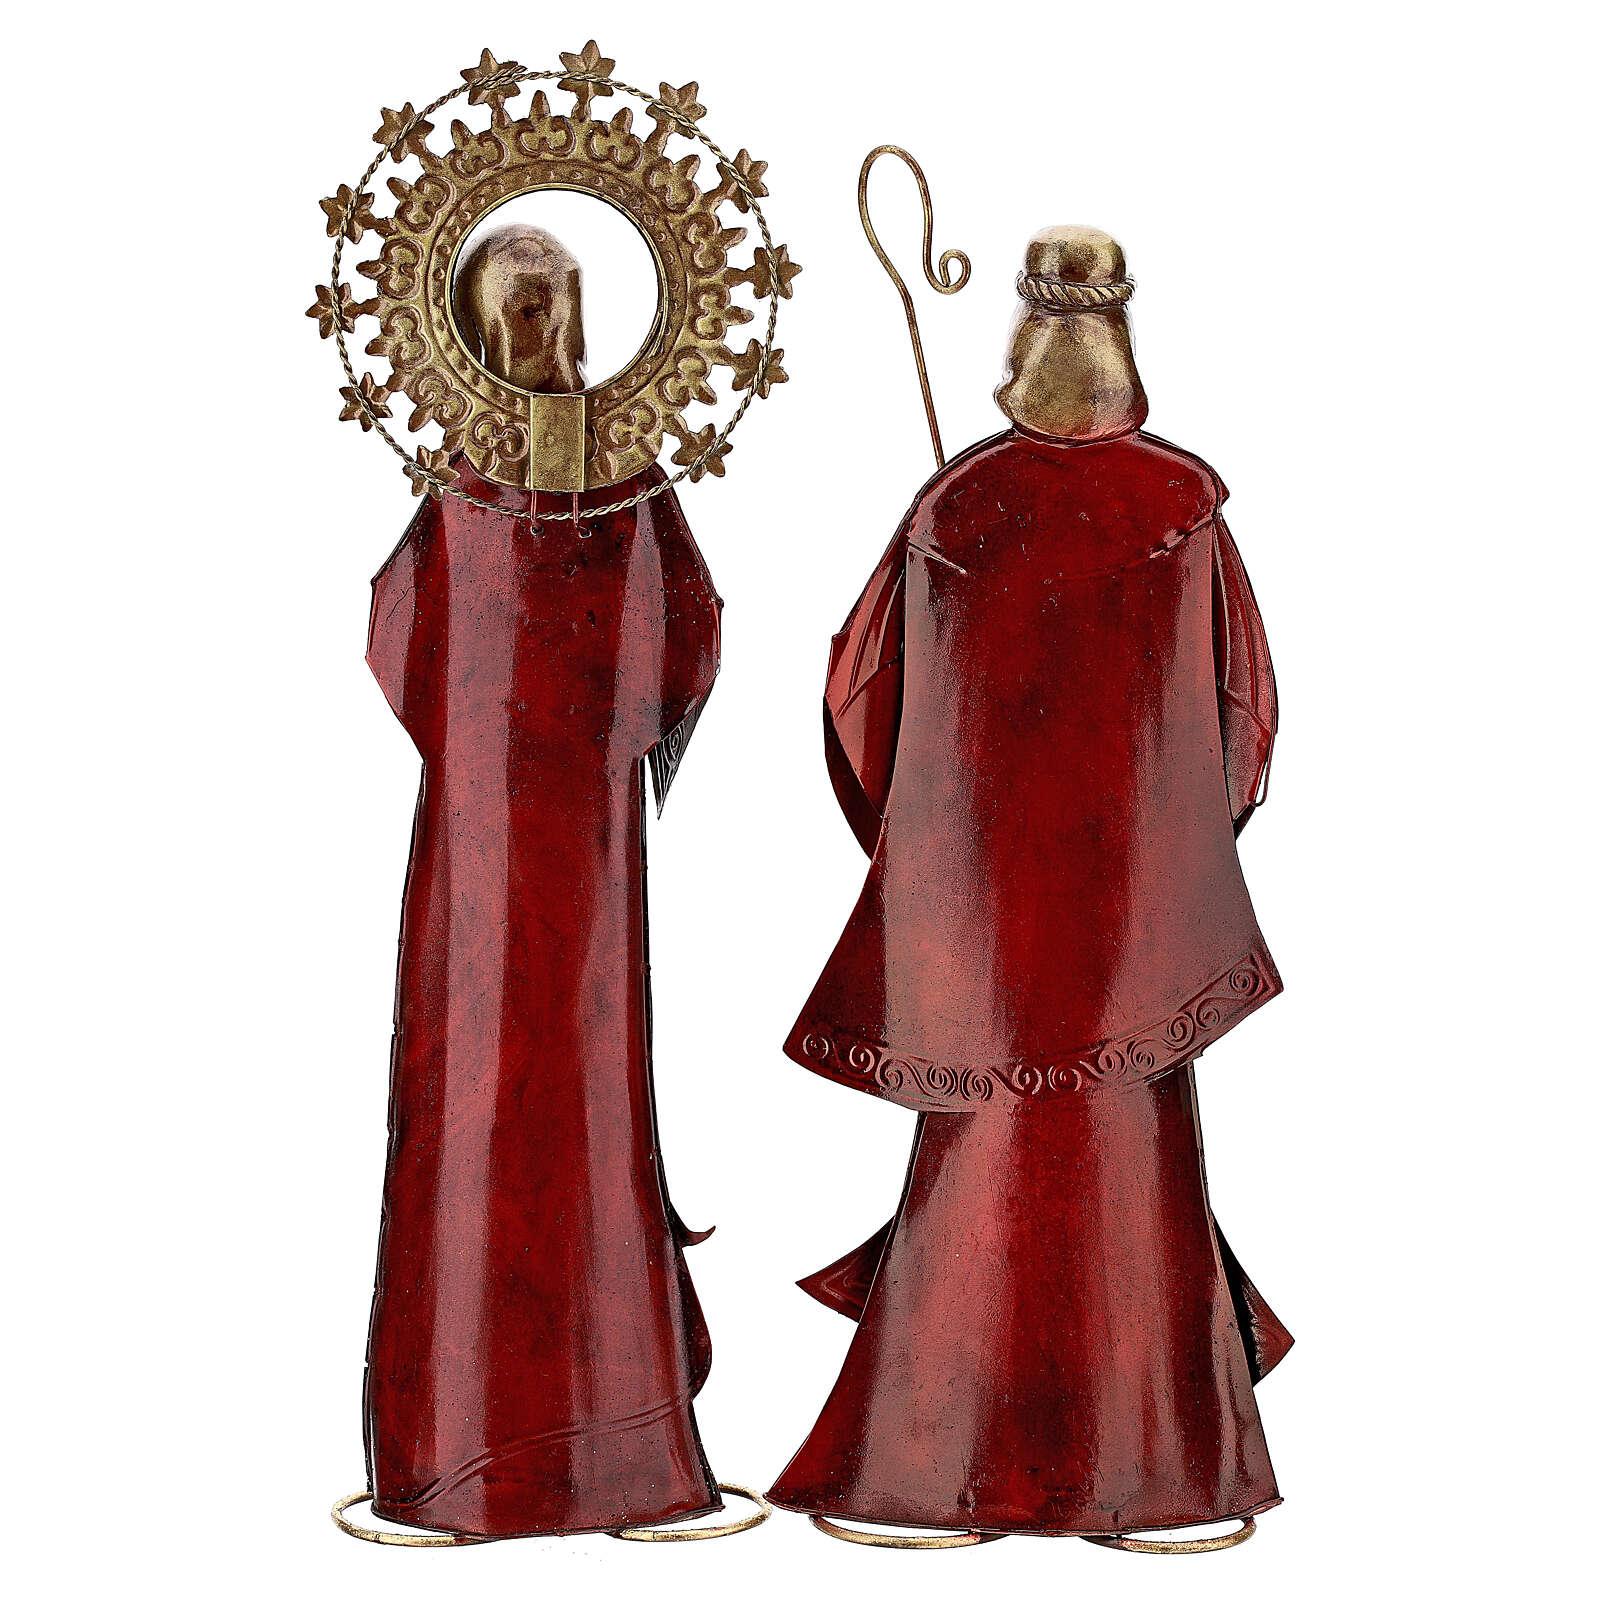 Nativity set 5 pcs in red gold metal, h 44 cm 4